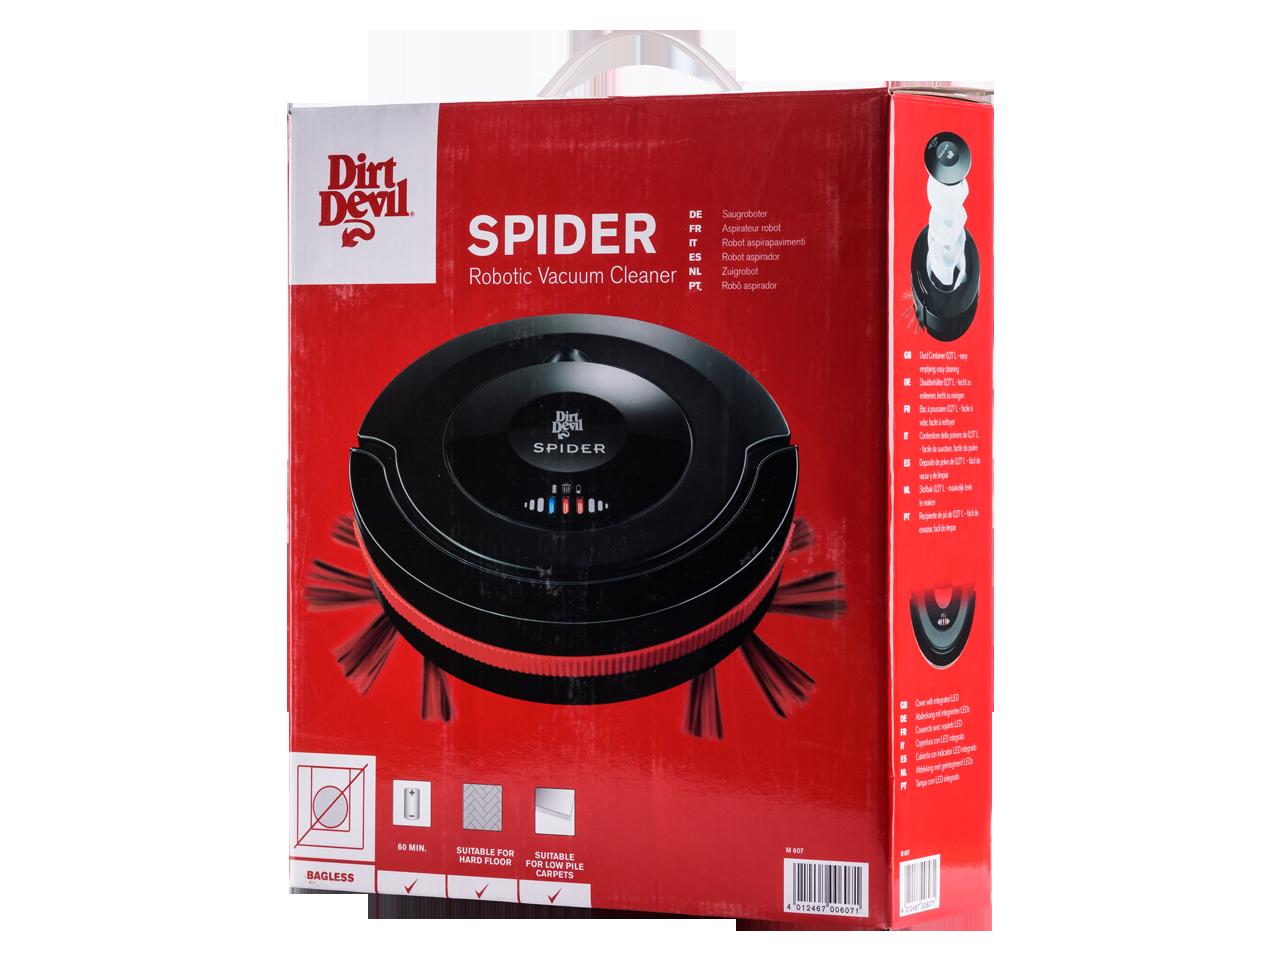 dirt devil spider